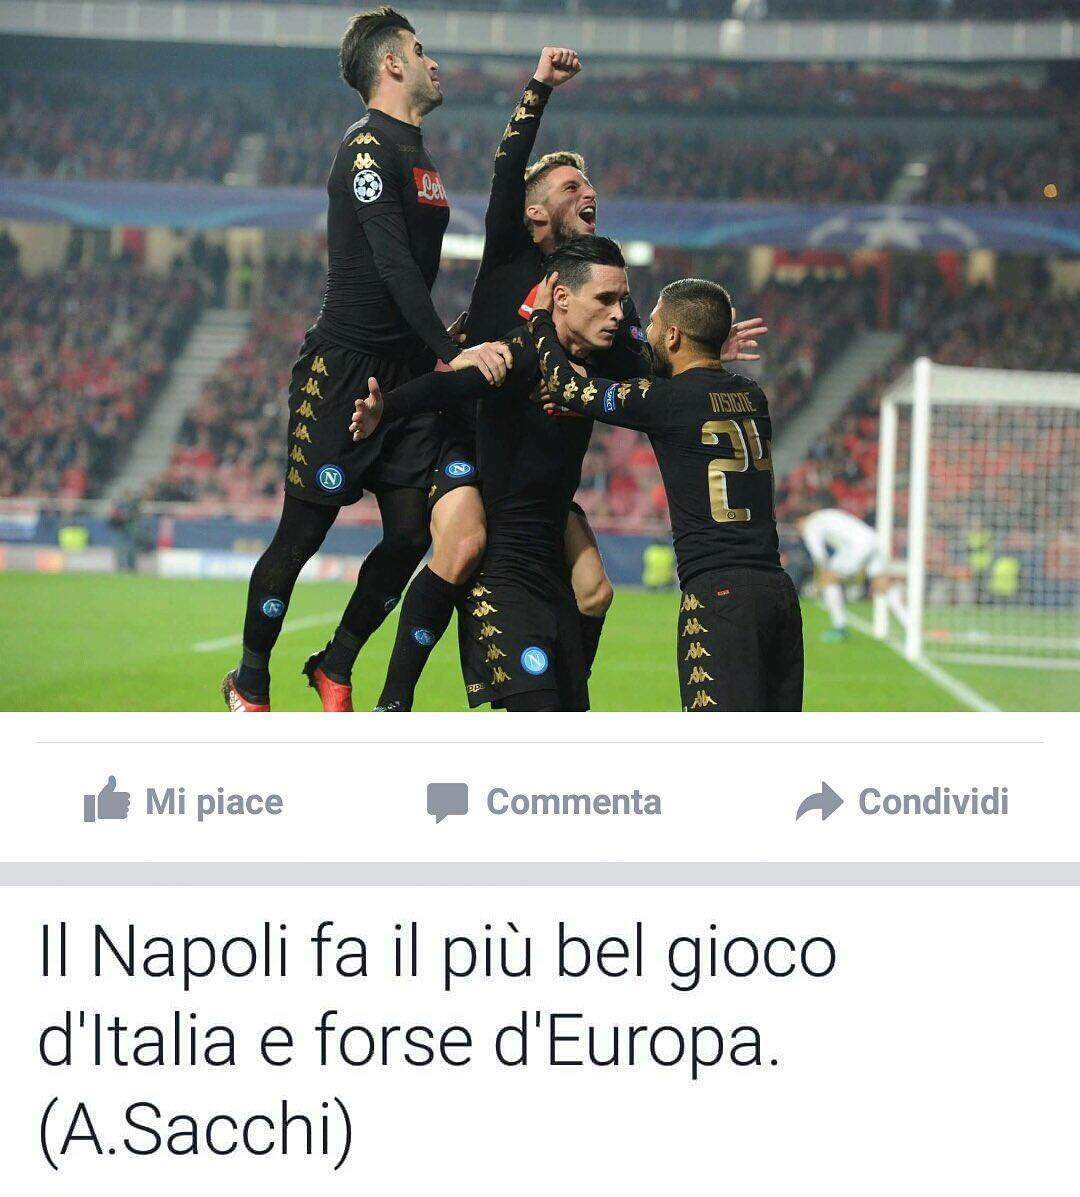 #BenficaNapoli